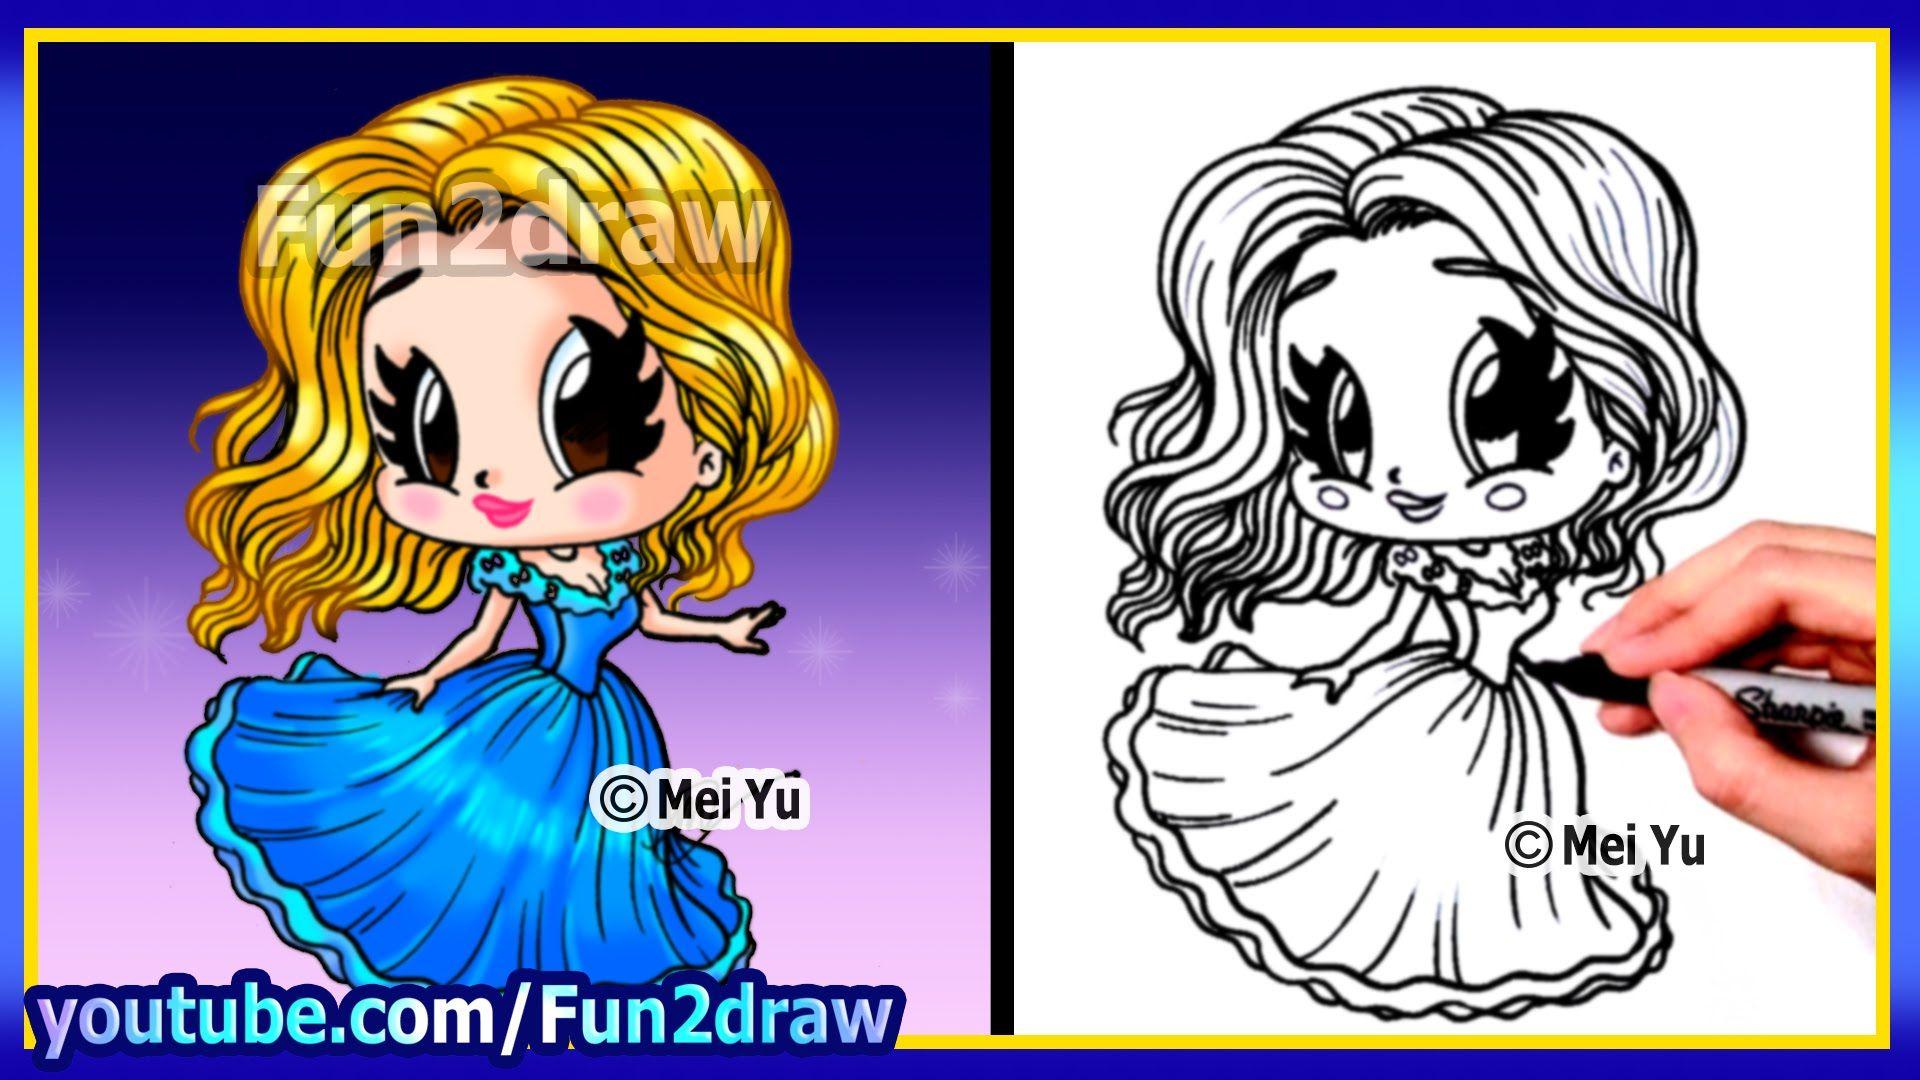 17 B Sta Bilder Om Fun 2 Draw Fan P Pinterest Tecknad Serie Chibi Och  Youtube More Images Of How To Draw A Cute Baby Dragon